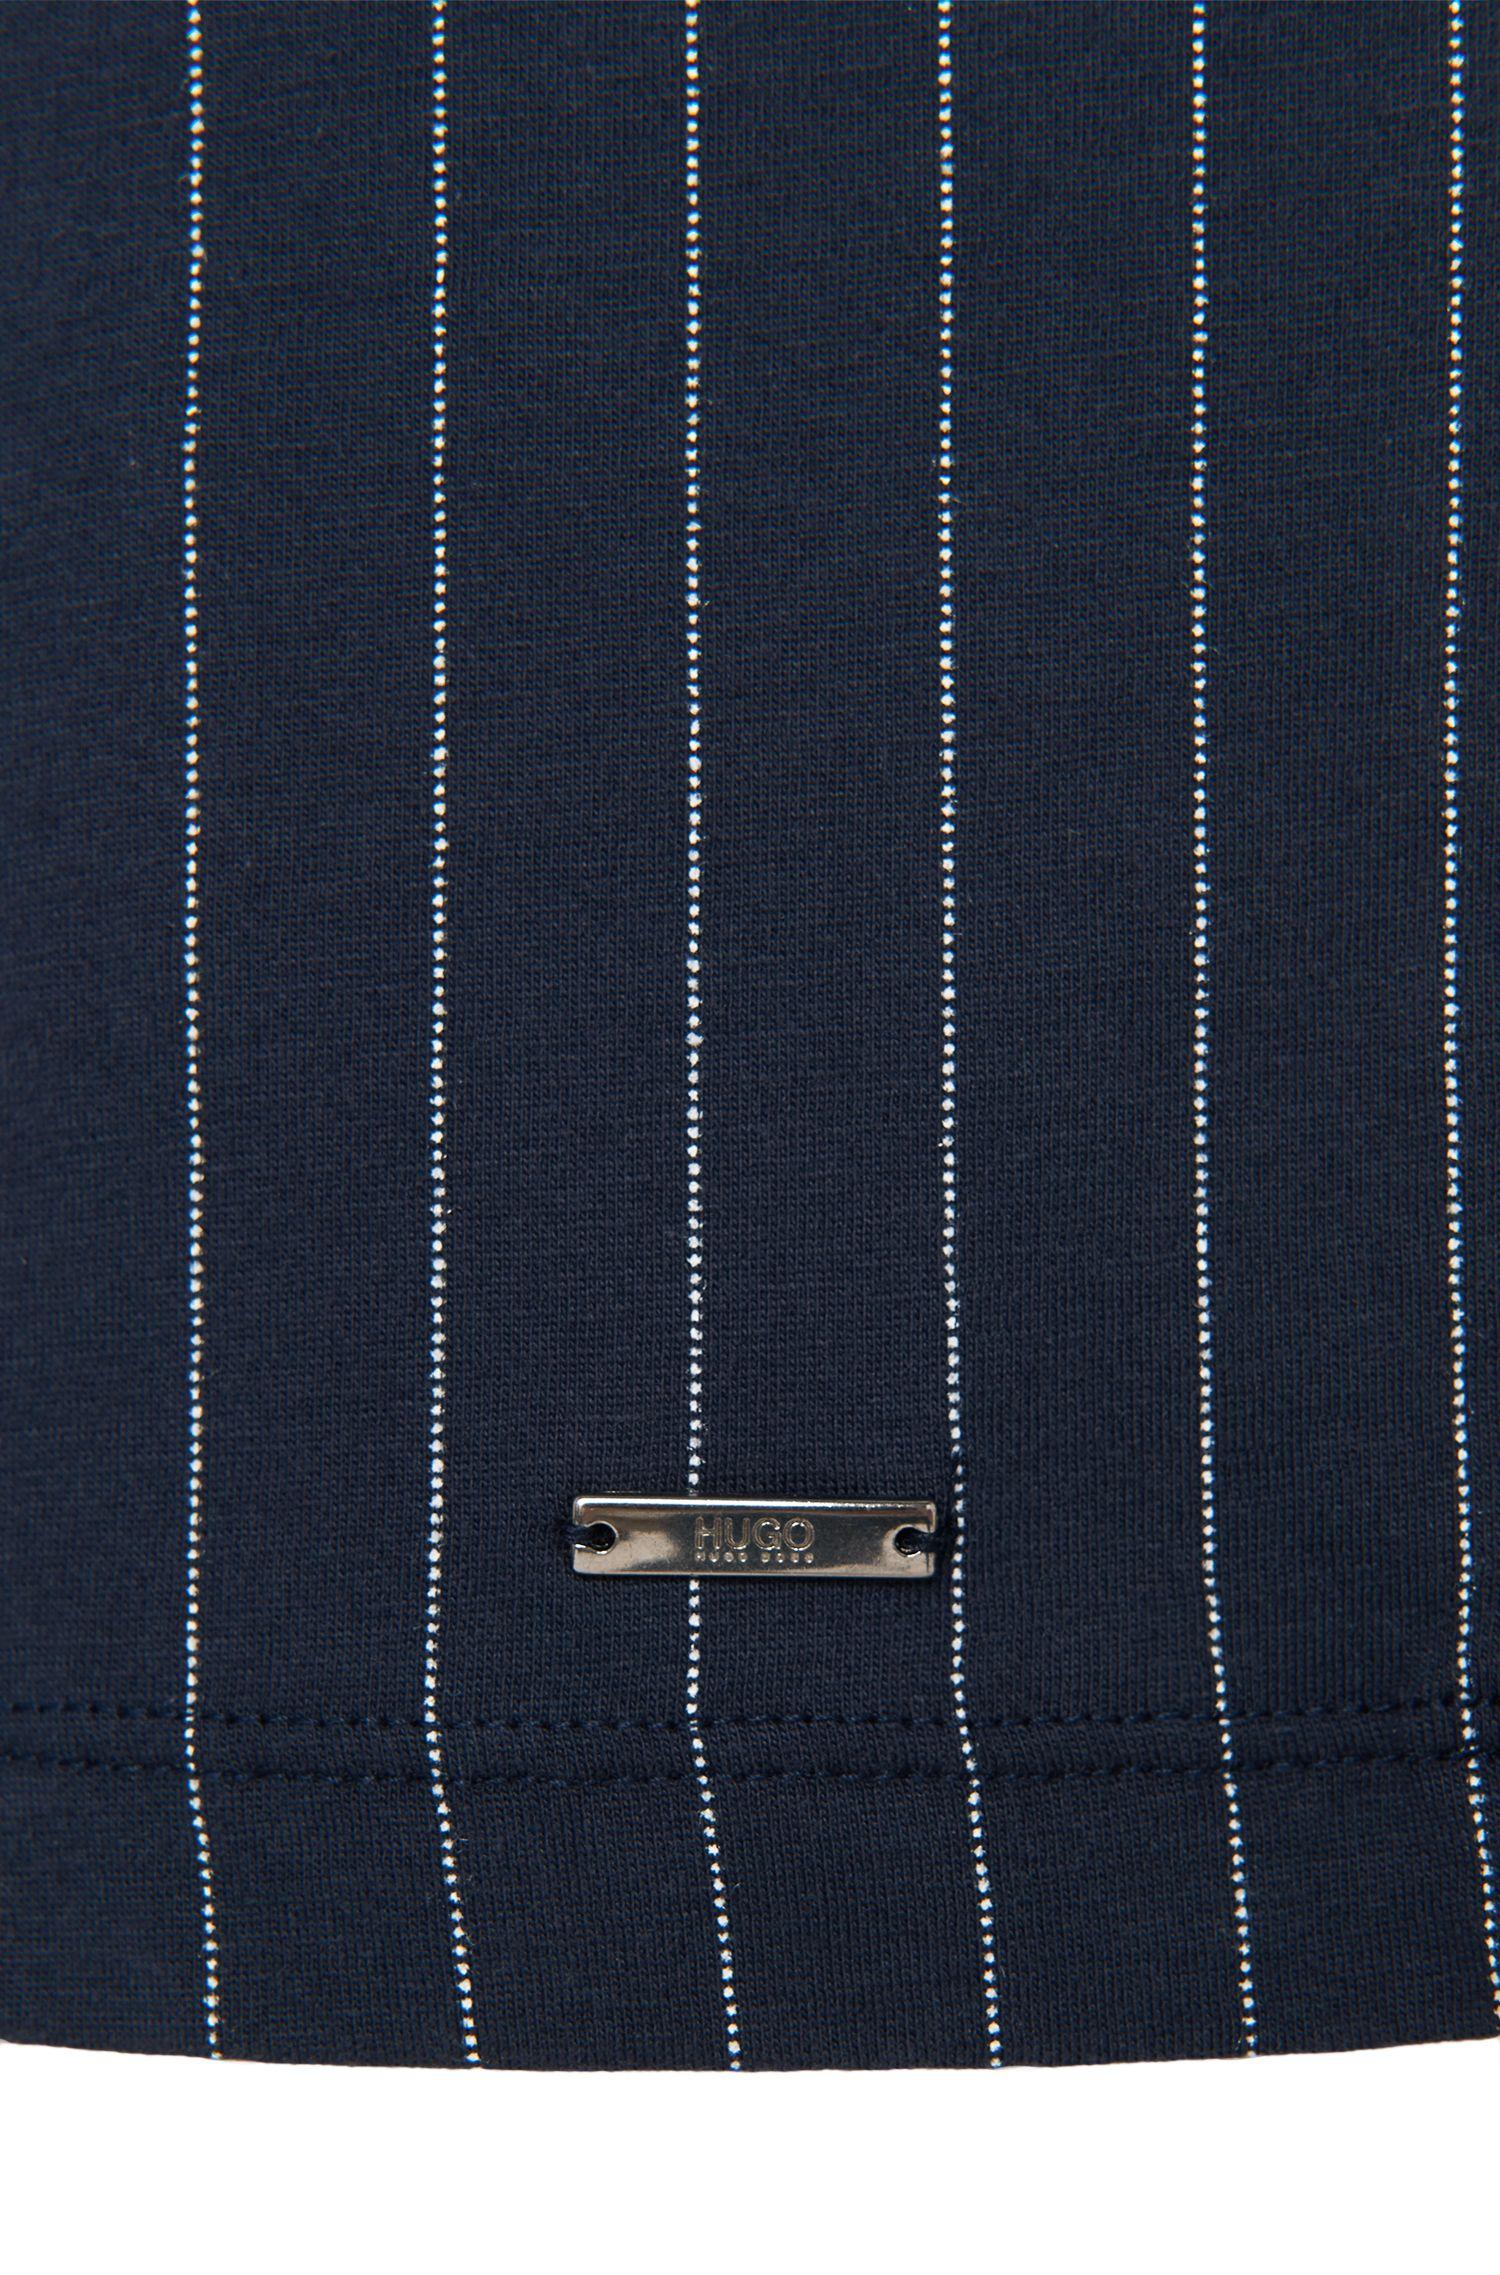 Gestreiftes Loose-Fit T-Shirt aus Baumwolle: 'Dineliner'